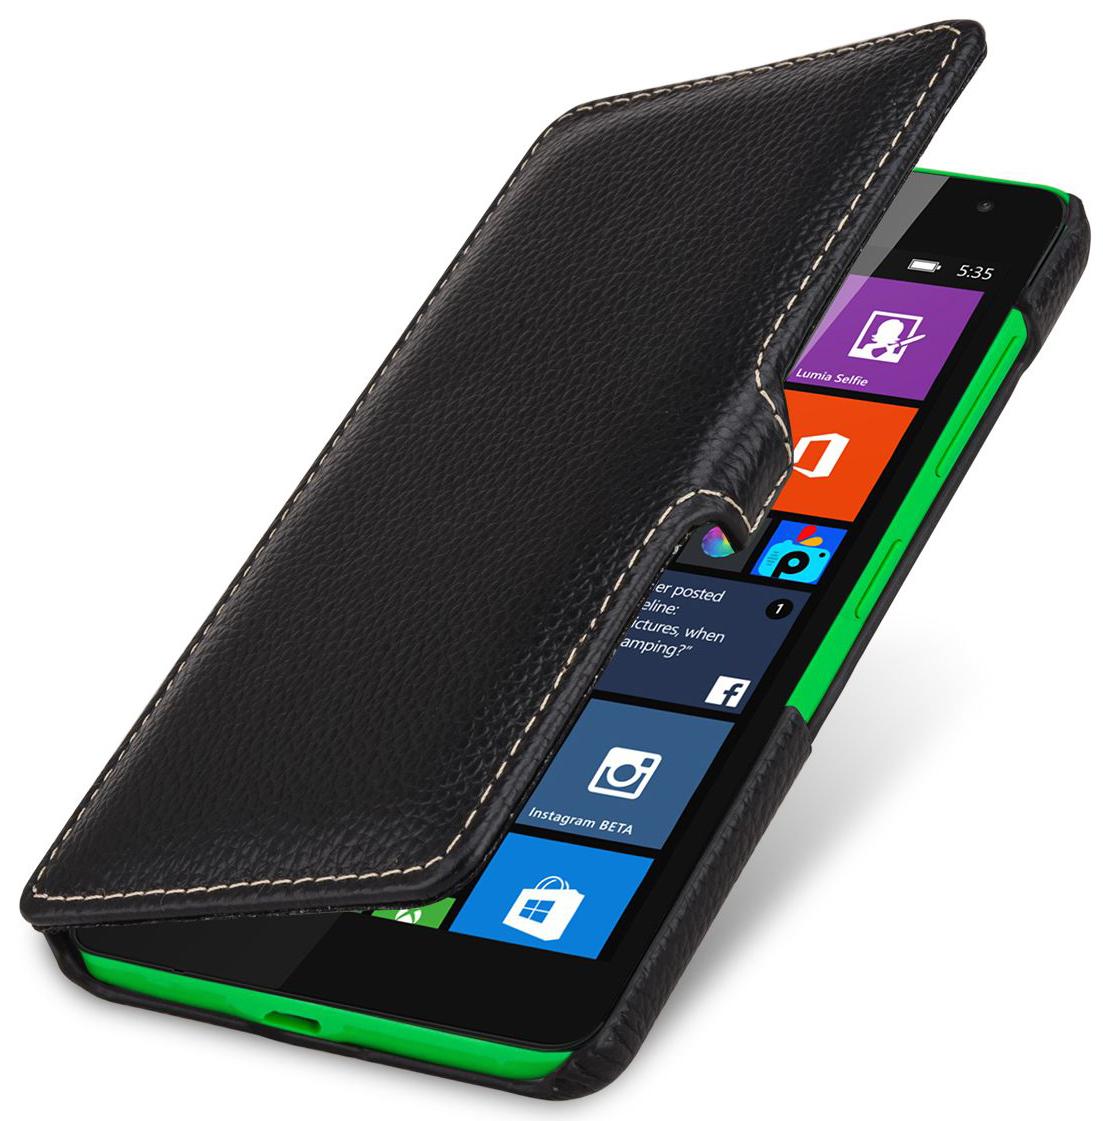 huge discount 32d6f 3f985 StilGut - Microsoft Lumia 535 case